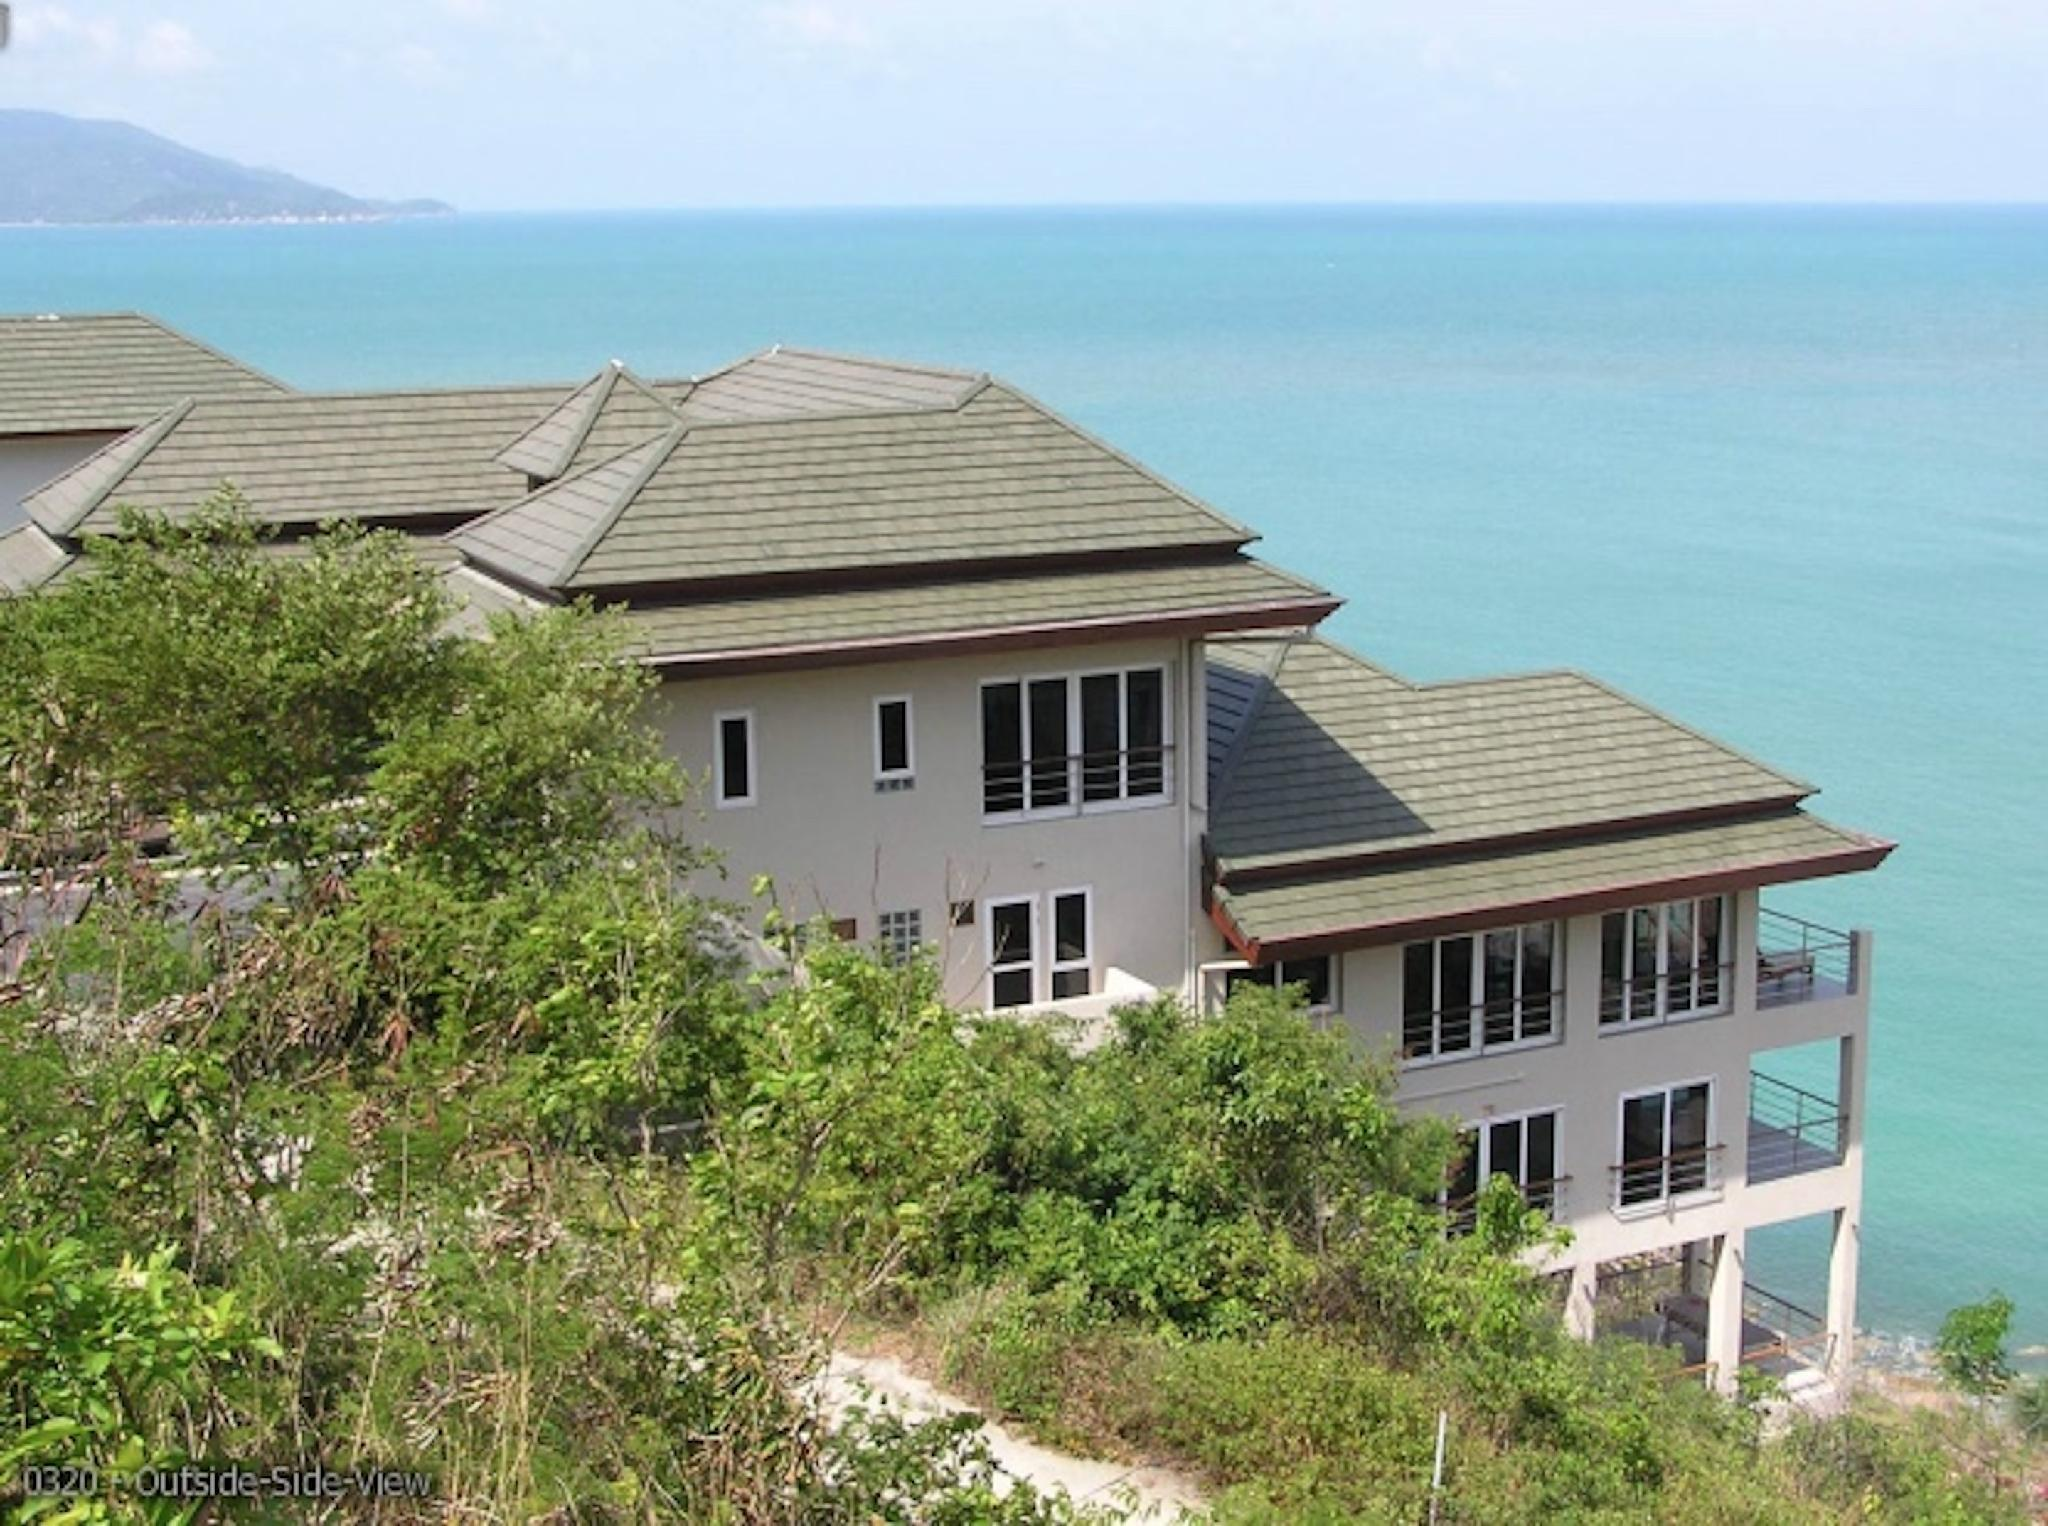 5 Bedroom Seaview Villa Tongson Bay (JP) 5 Bedroom Seaview Villa Tongson Bay (JP)